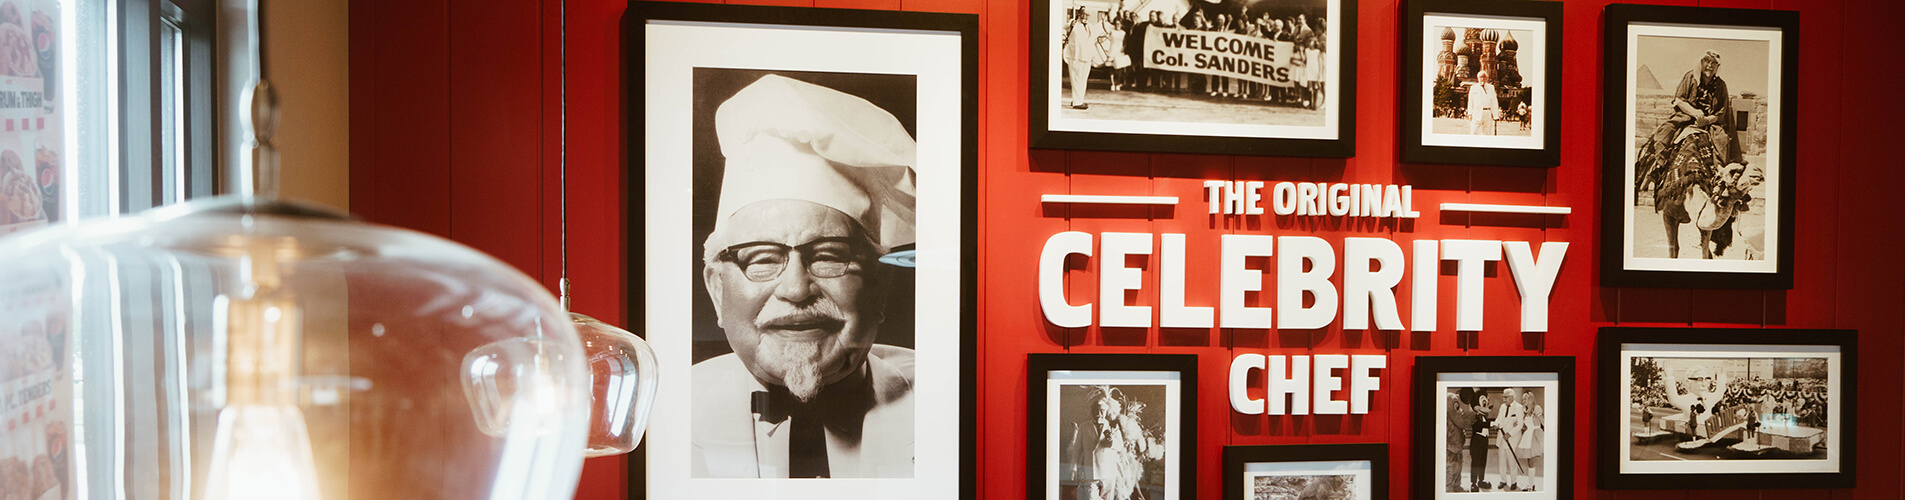 KFC Celebrity Chef wall